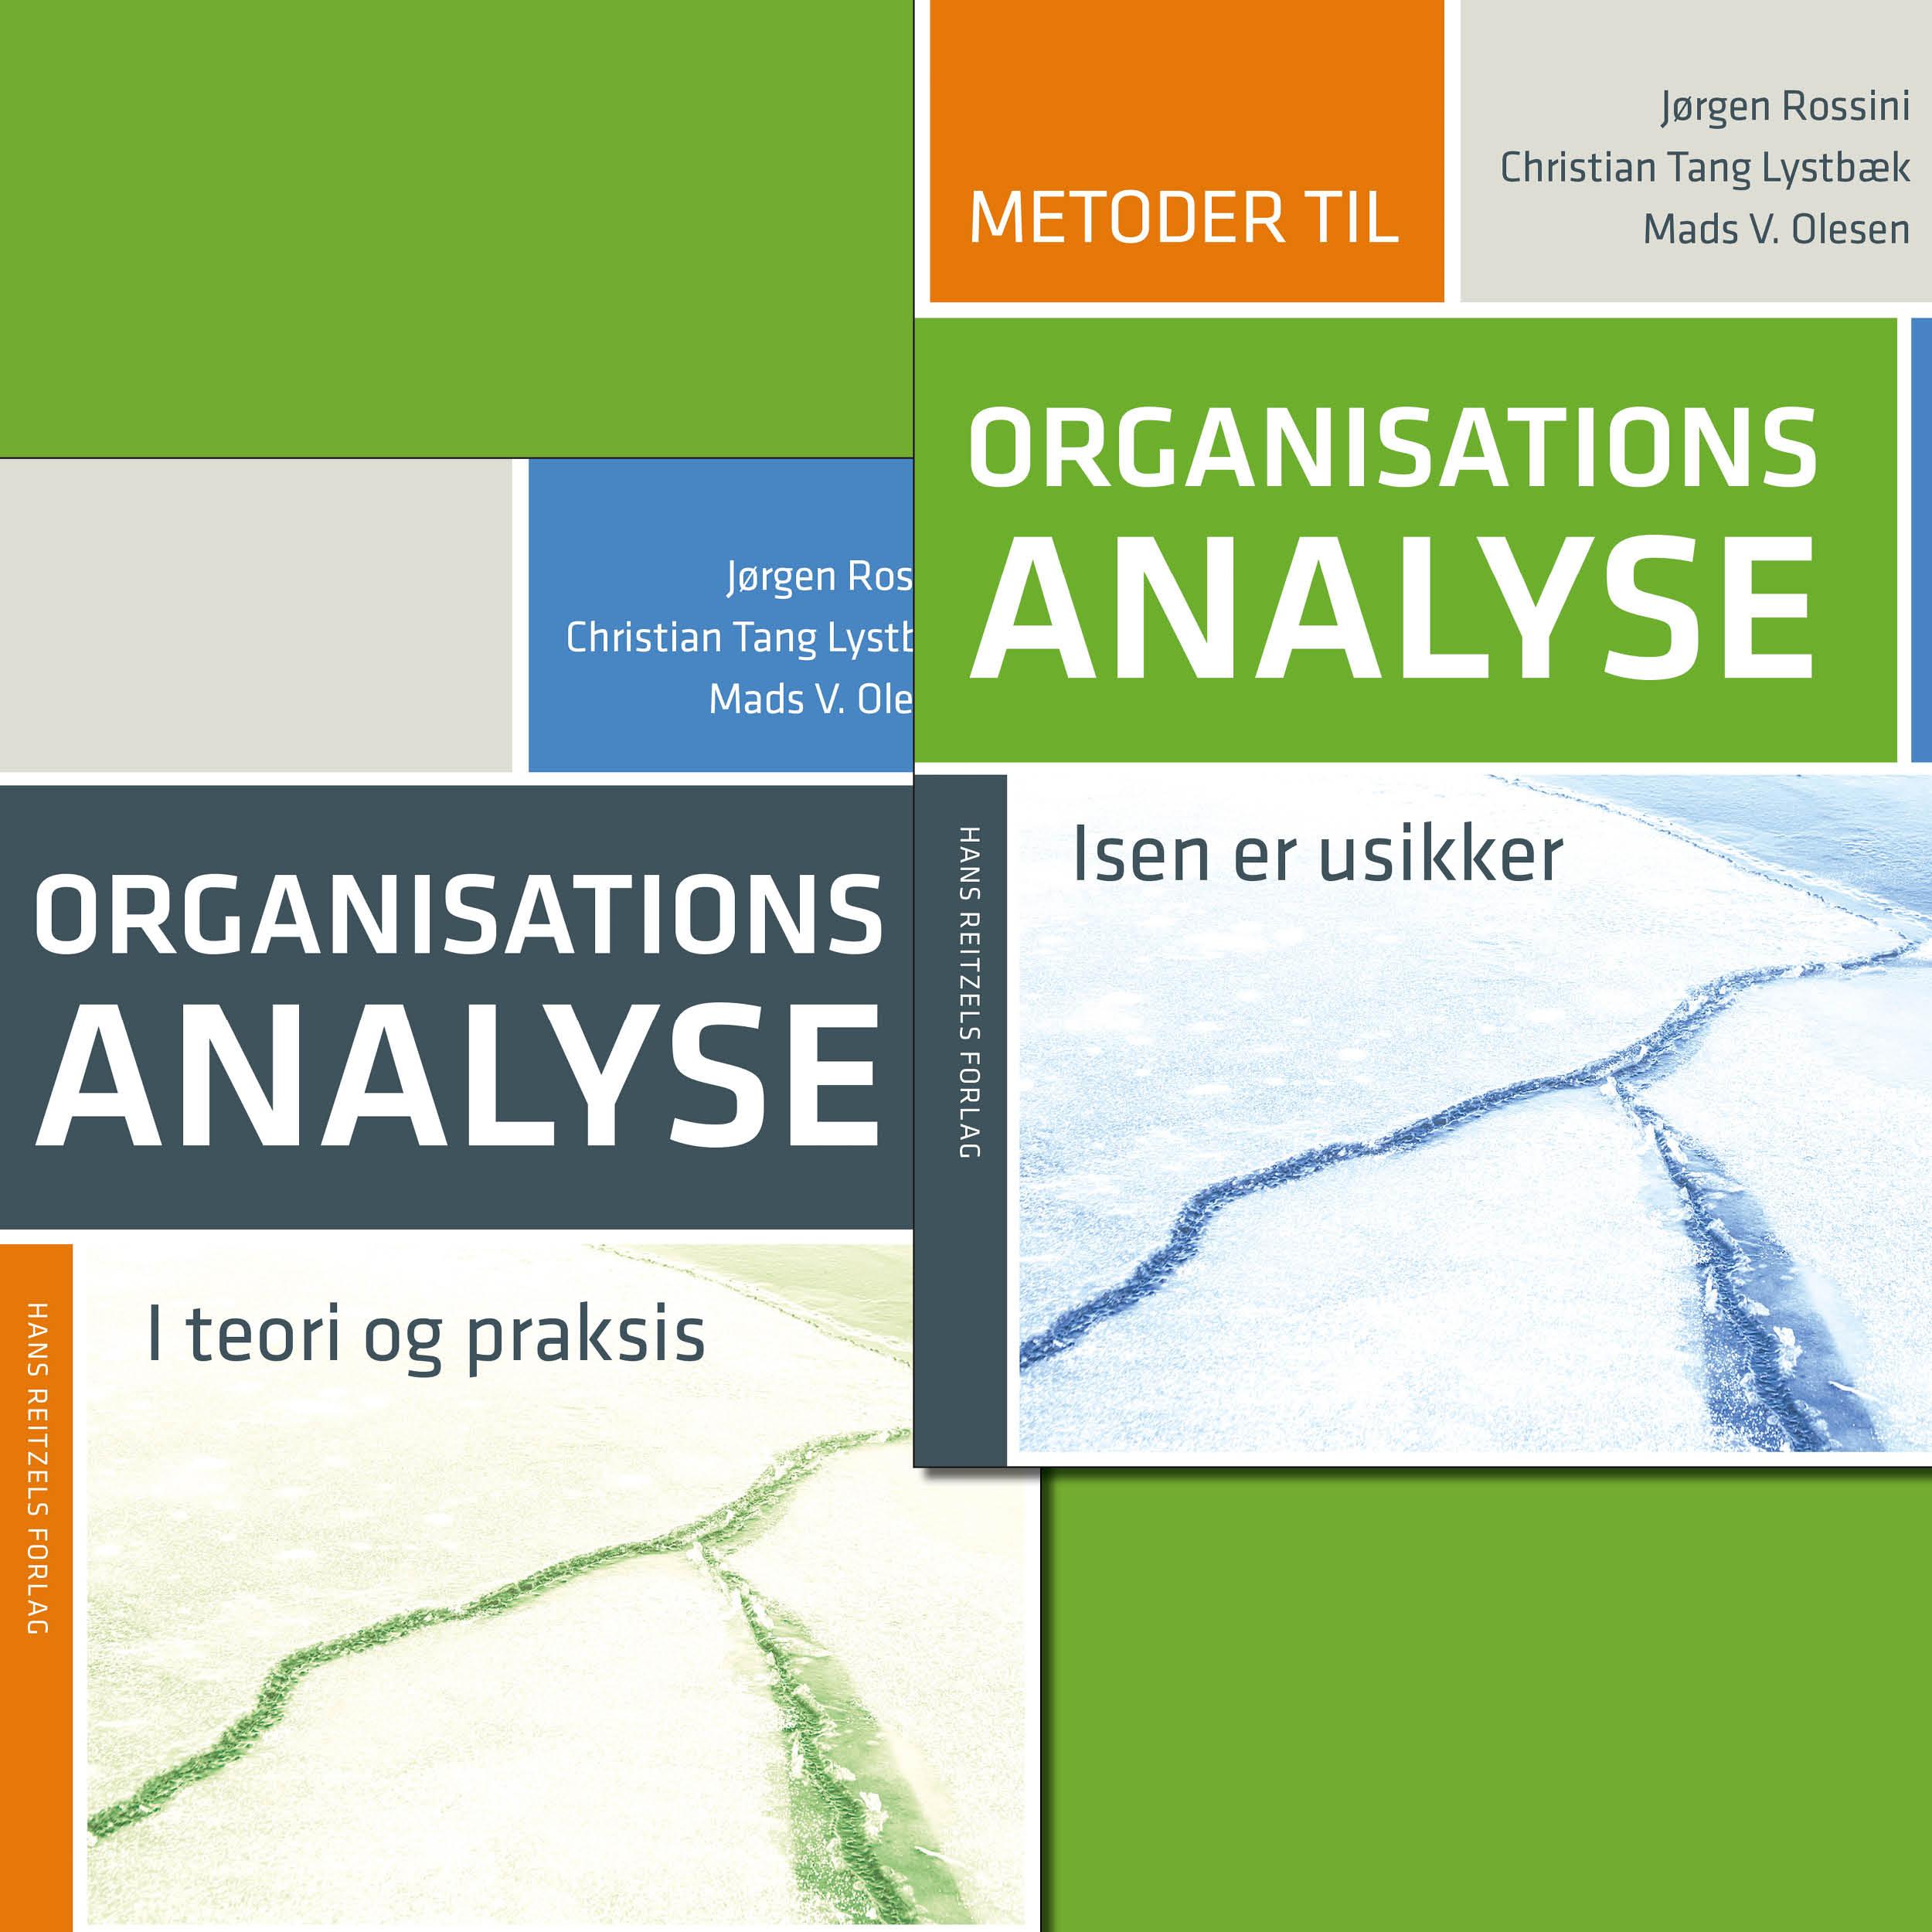 organisationsteori i praksis